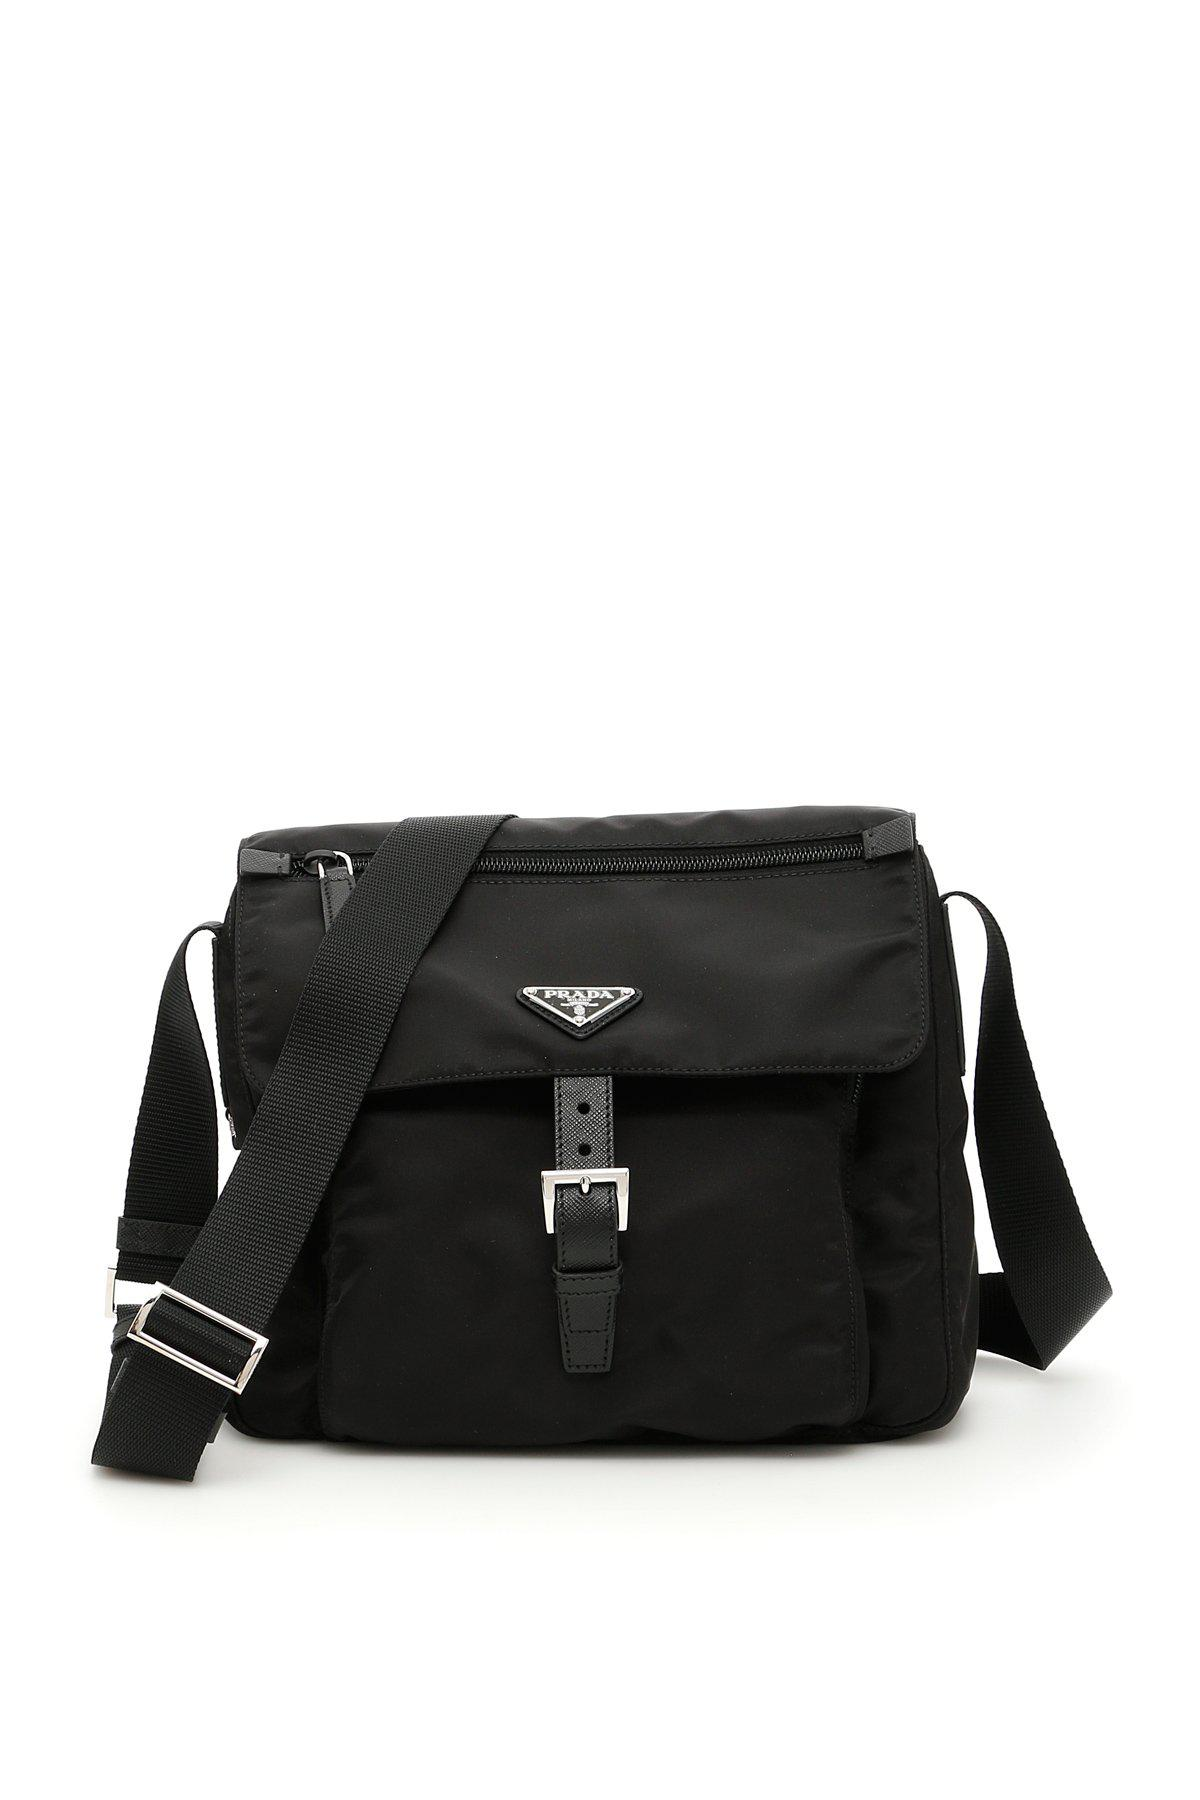 7d42359c154f ... italy prada logo plaque crossbody bag in black lyst 6b038 99848 ...